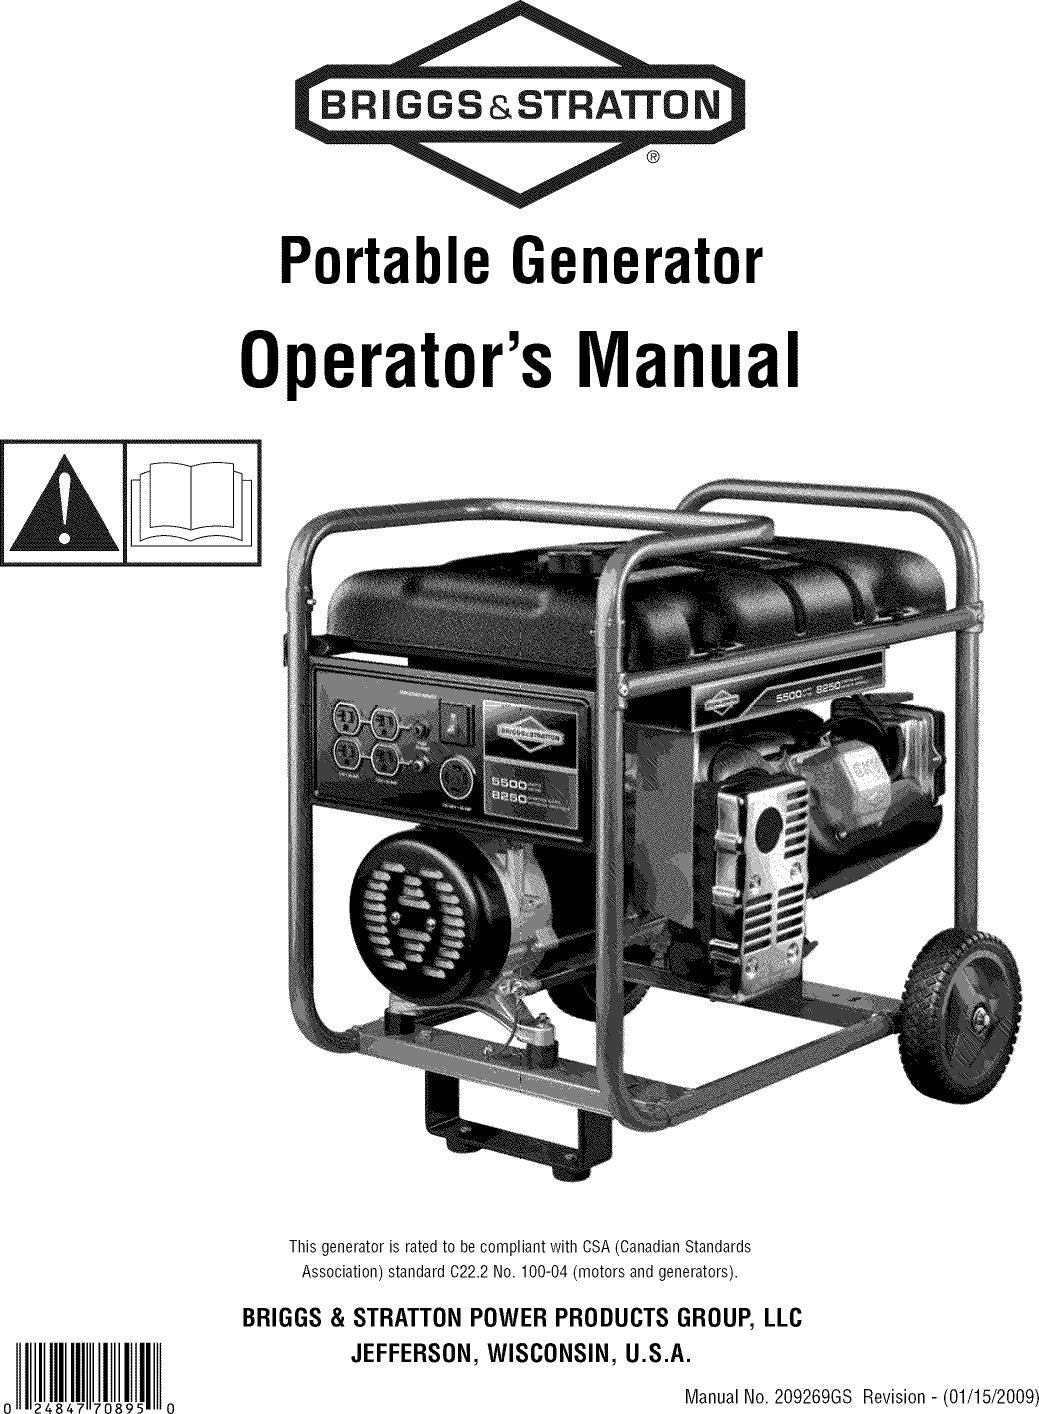 Briggs & Stratton 030439 User Manual GENERATOR Manuals And